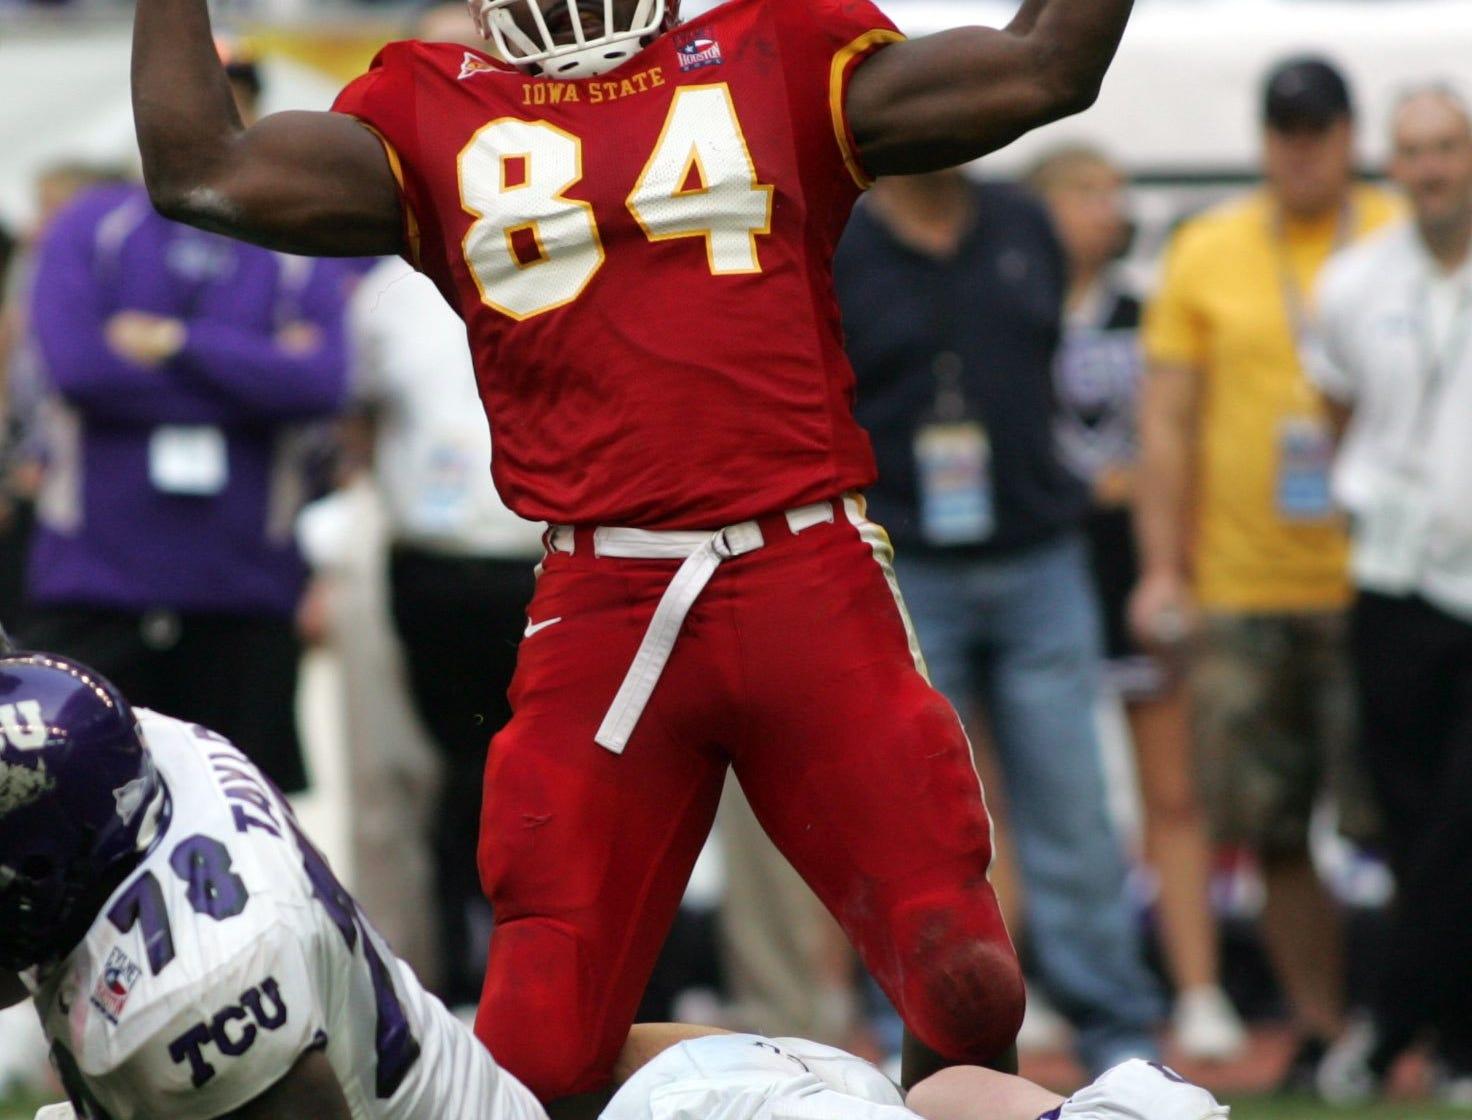 The Cyclones' Jason Berryman celebrates a sack of TCU quarterback Jeff Ballard during the 2005 Houston Bowl.